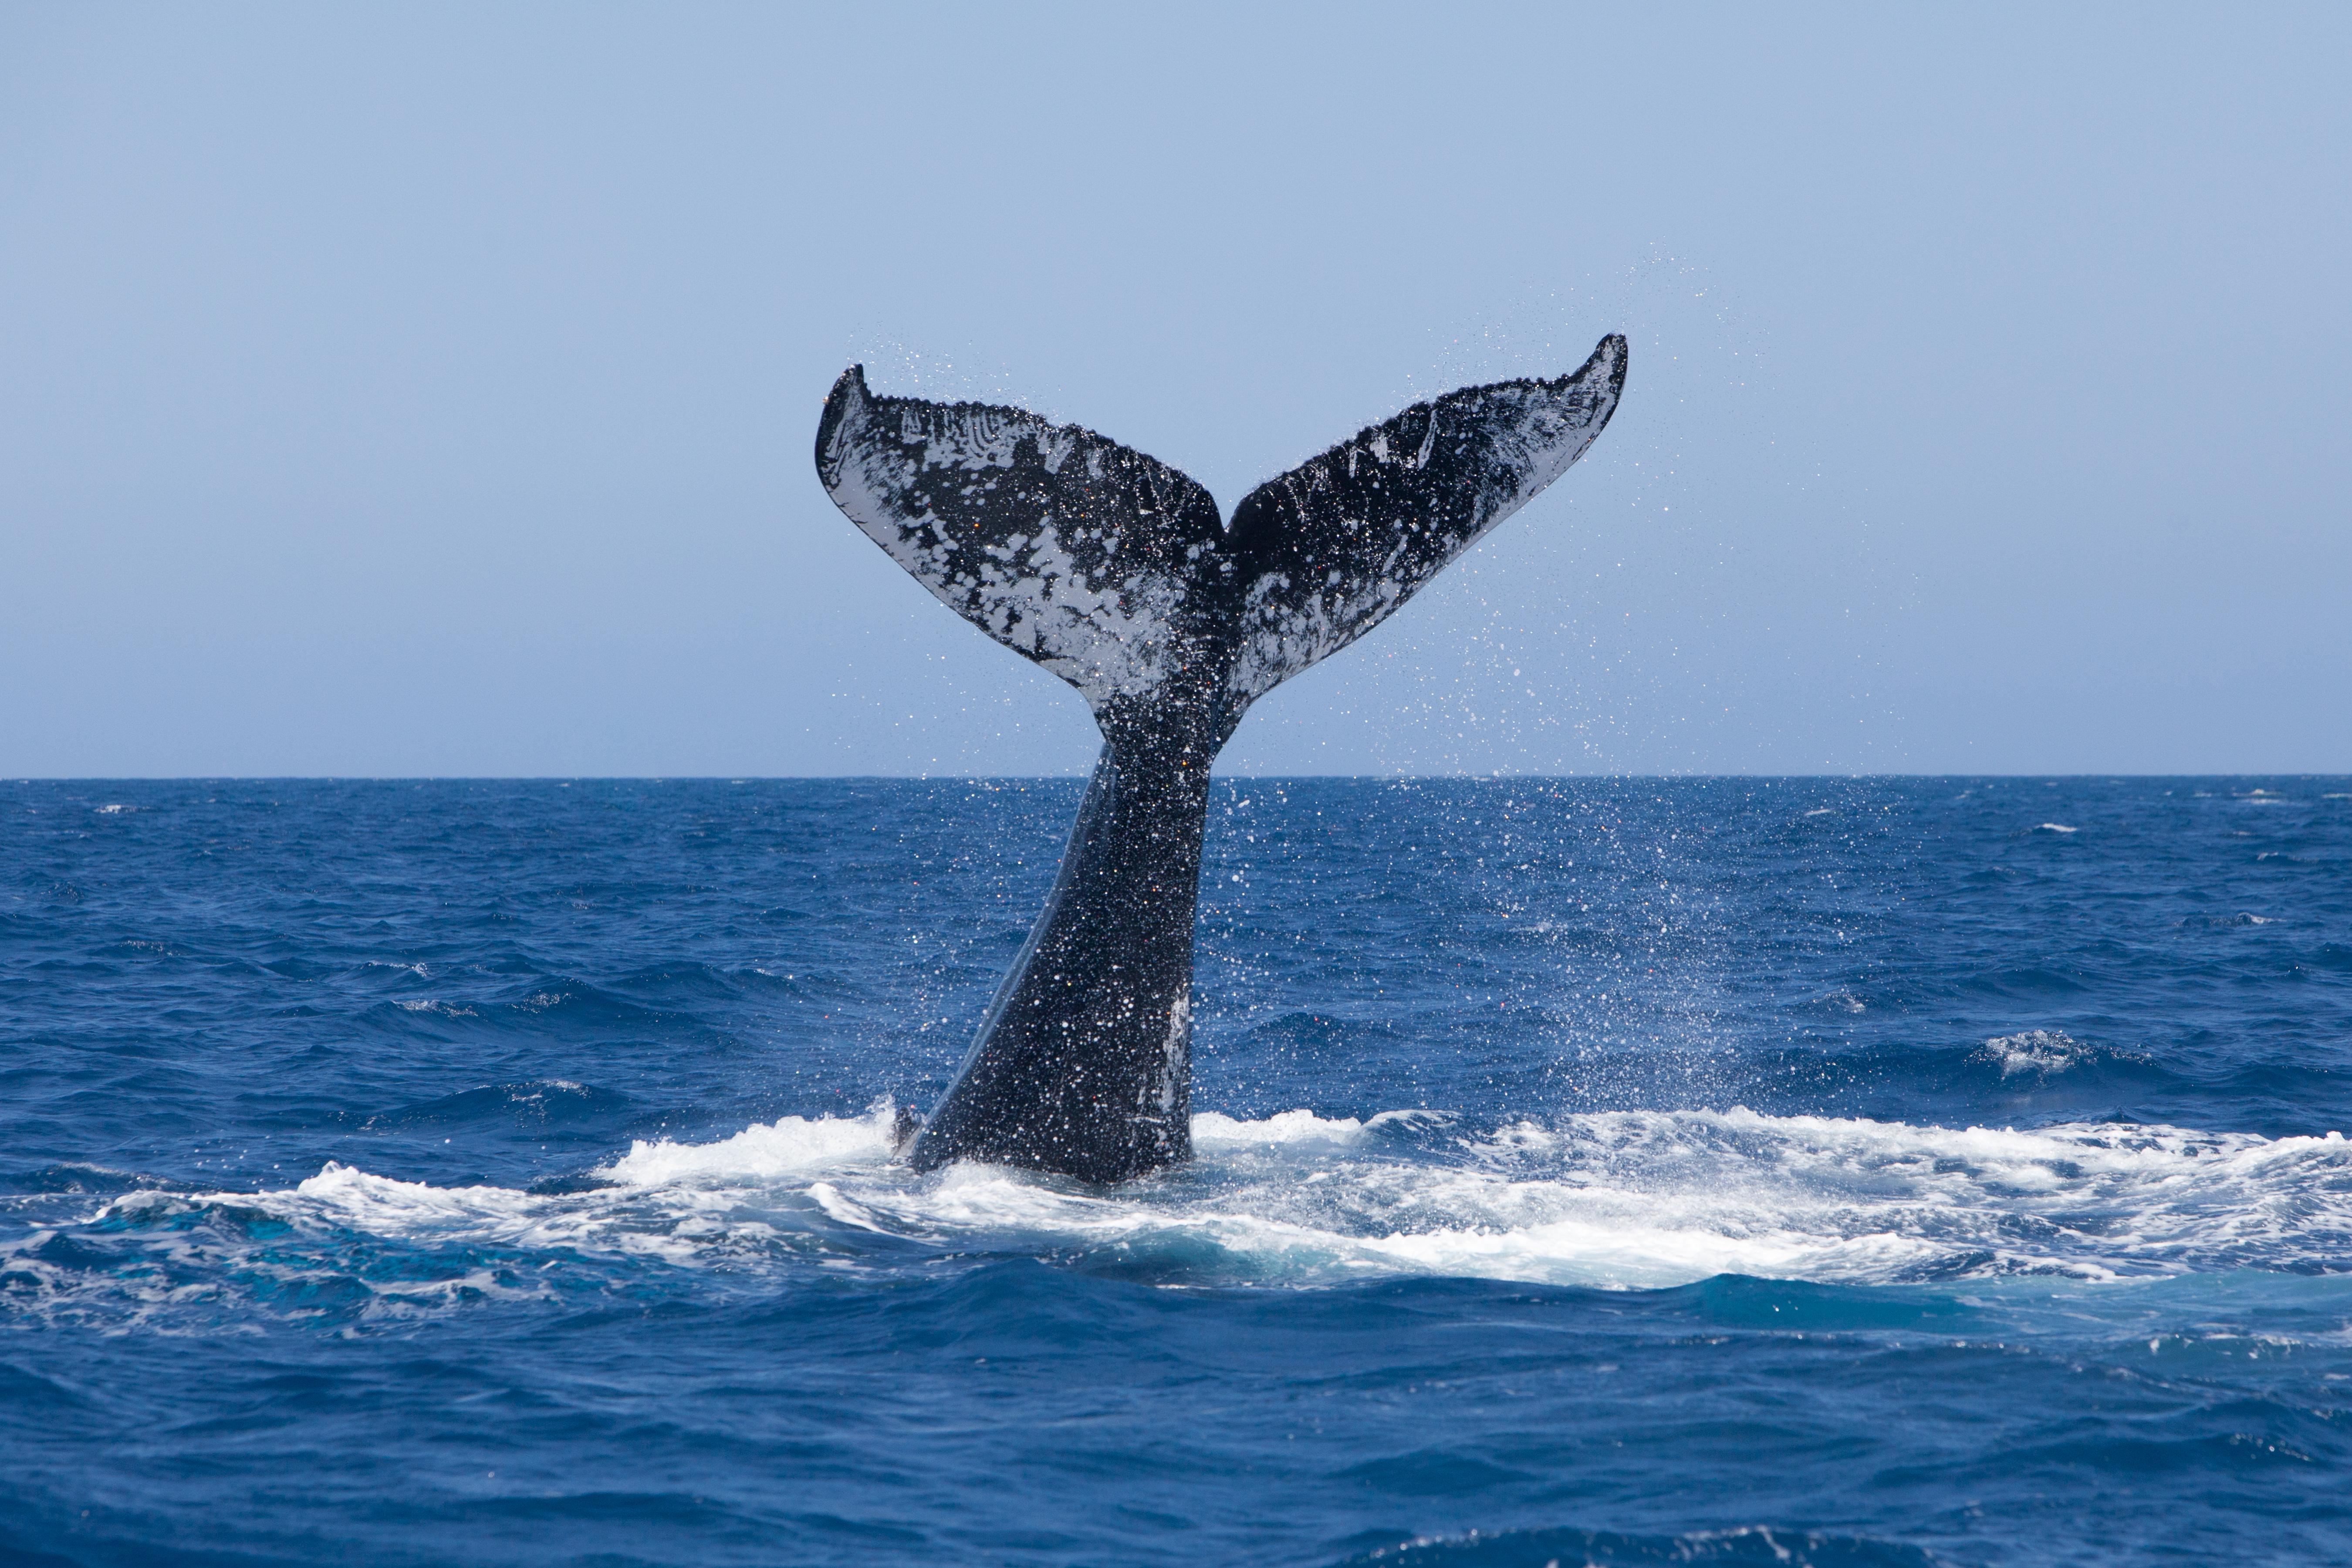 Canada 150 Whale